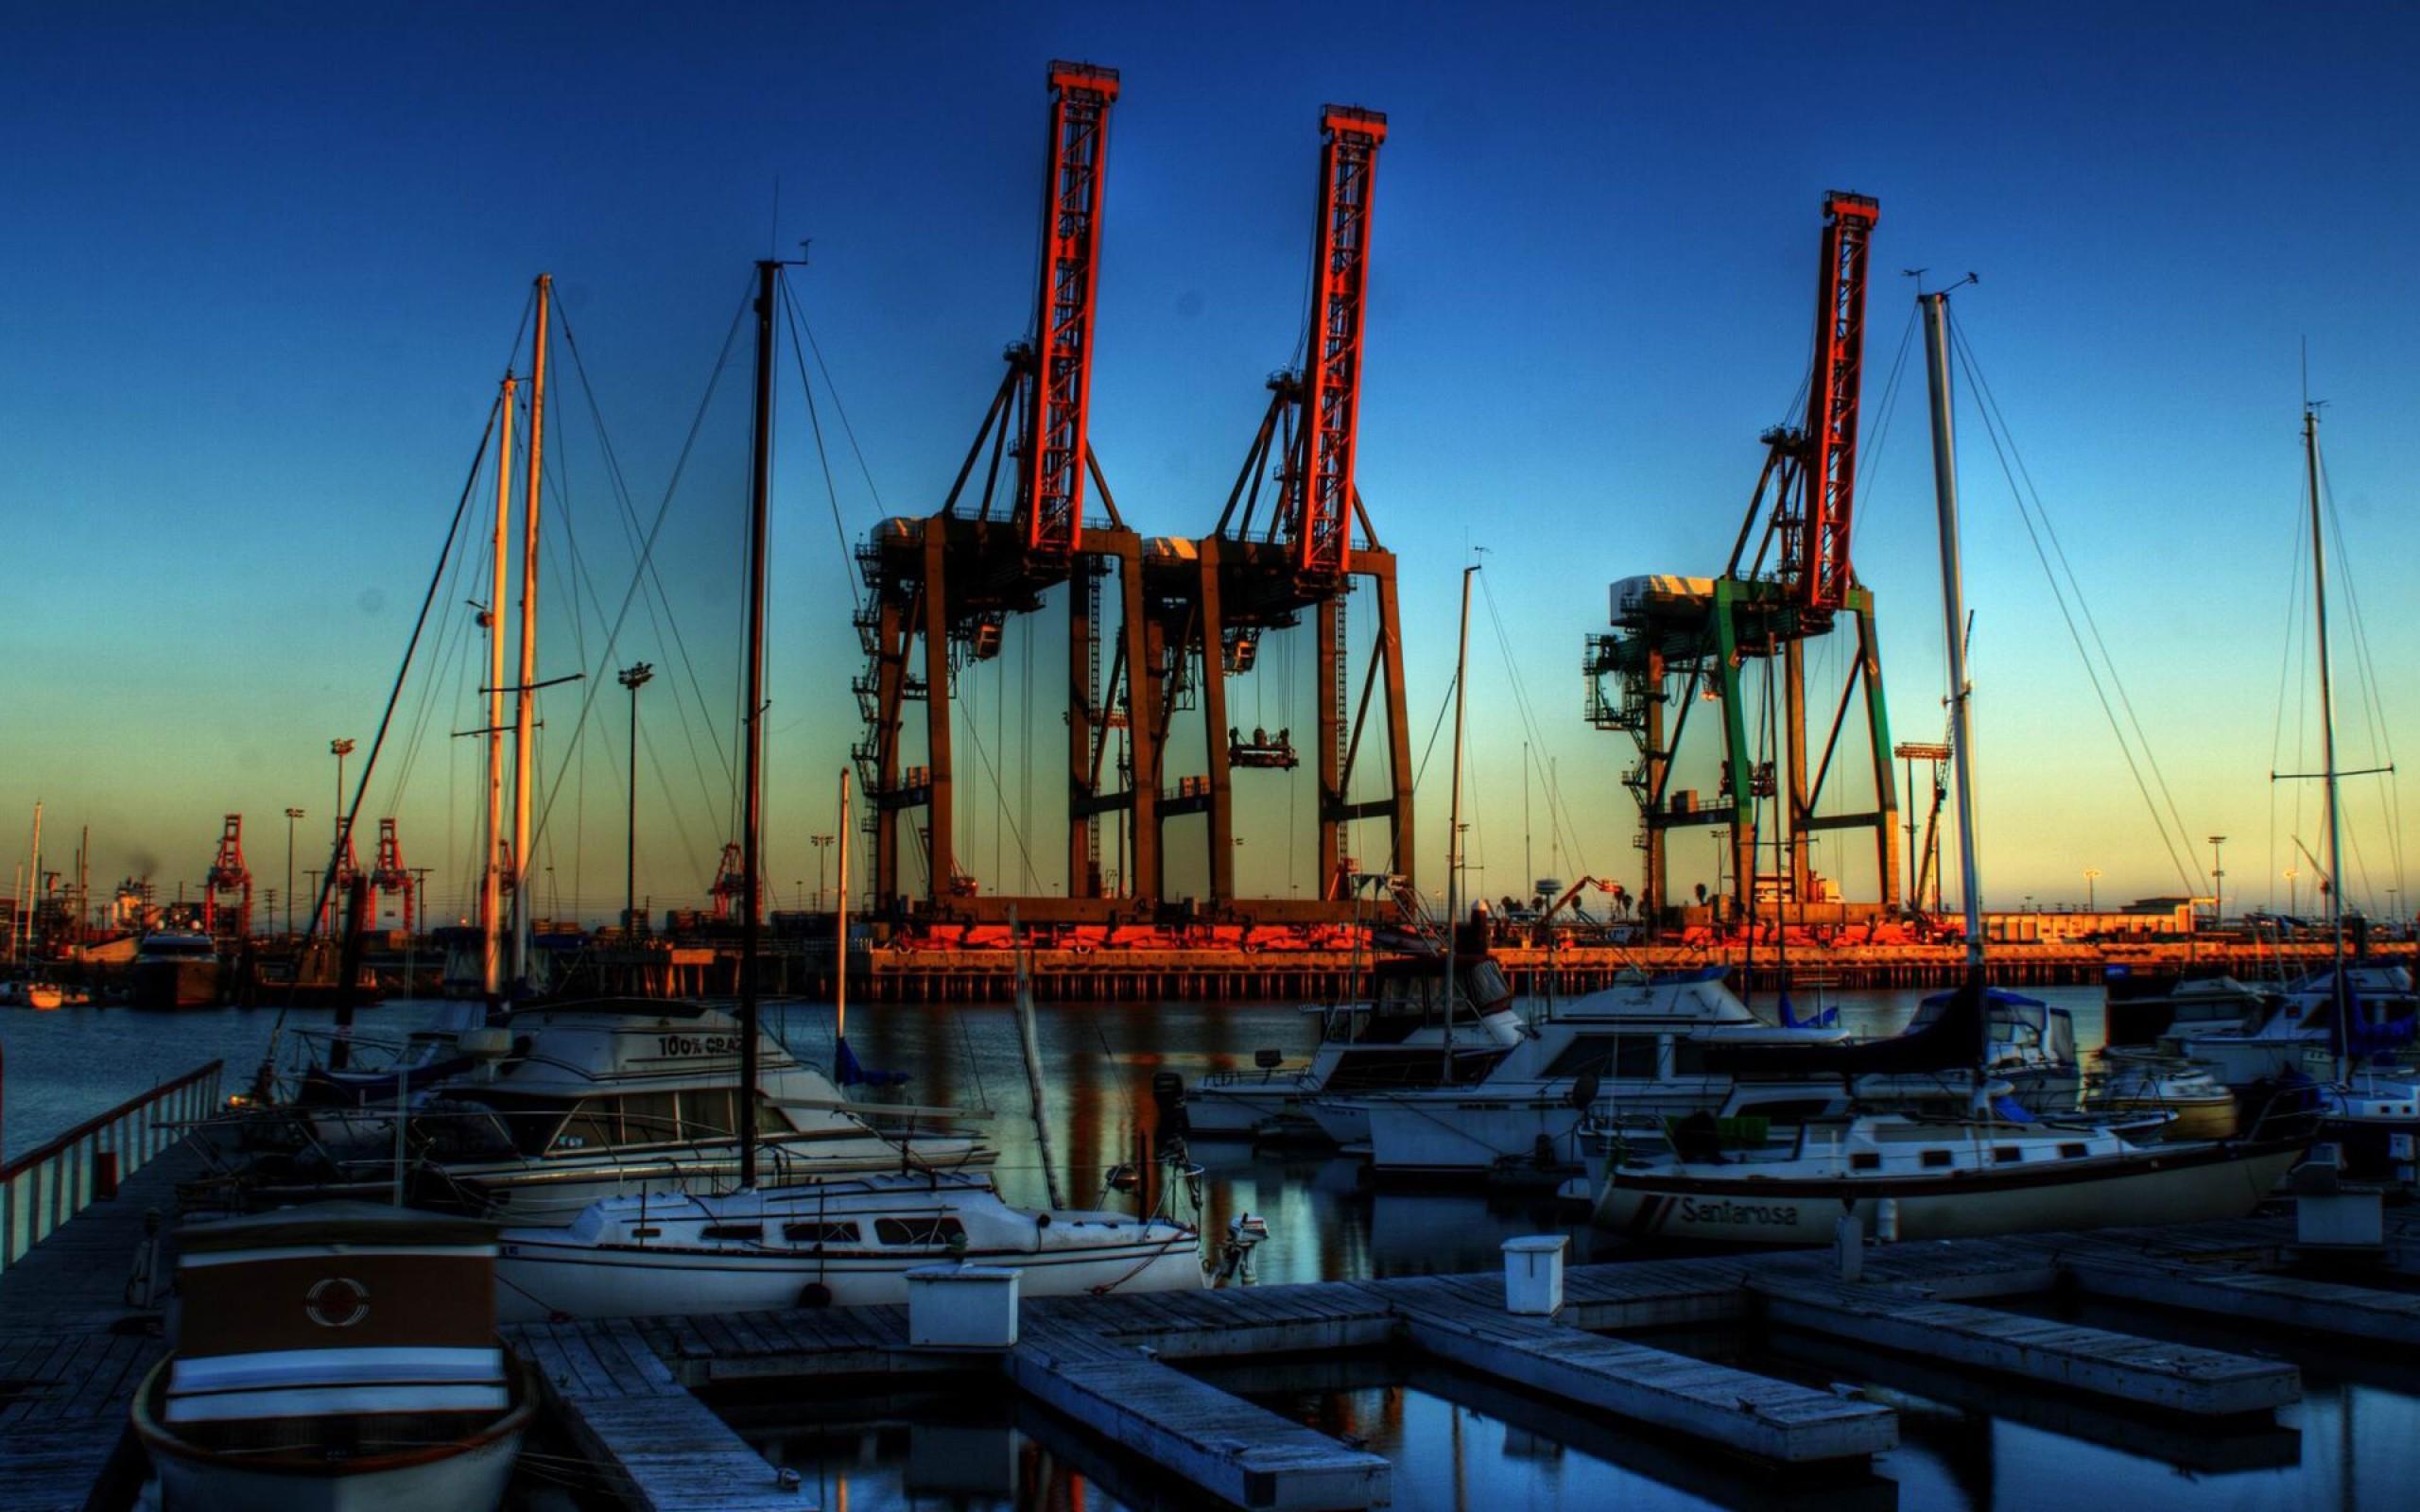 Port of Los Angeles  Sunset  HD Wallpaper